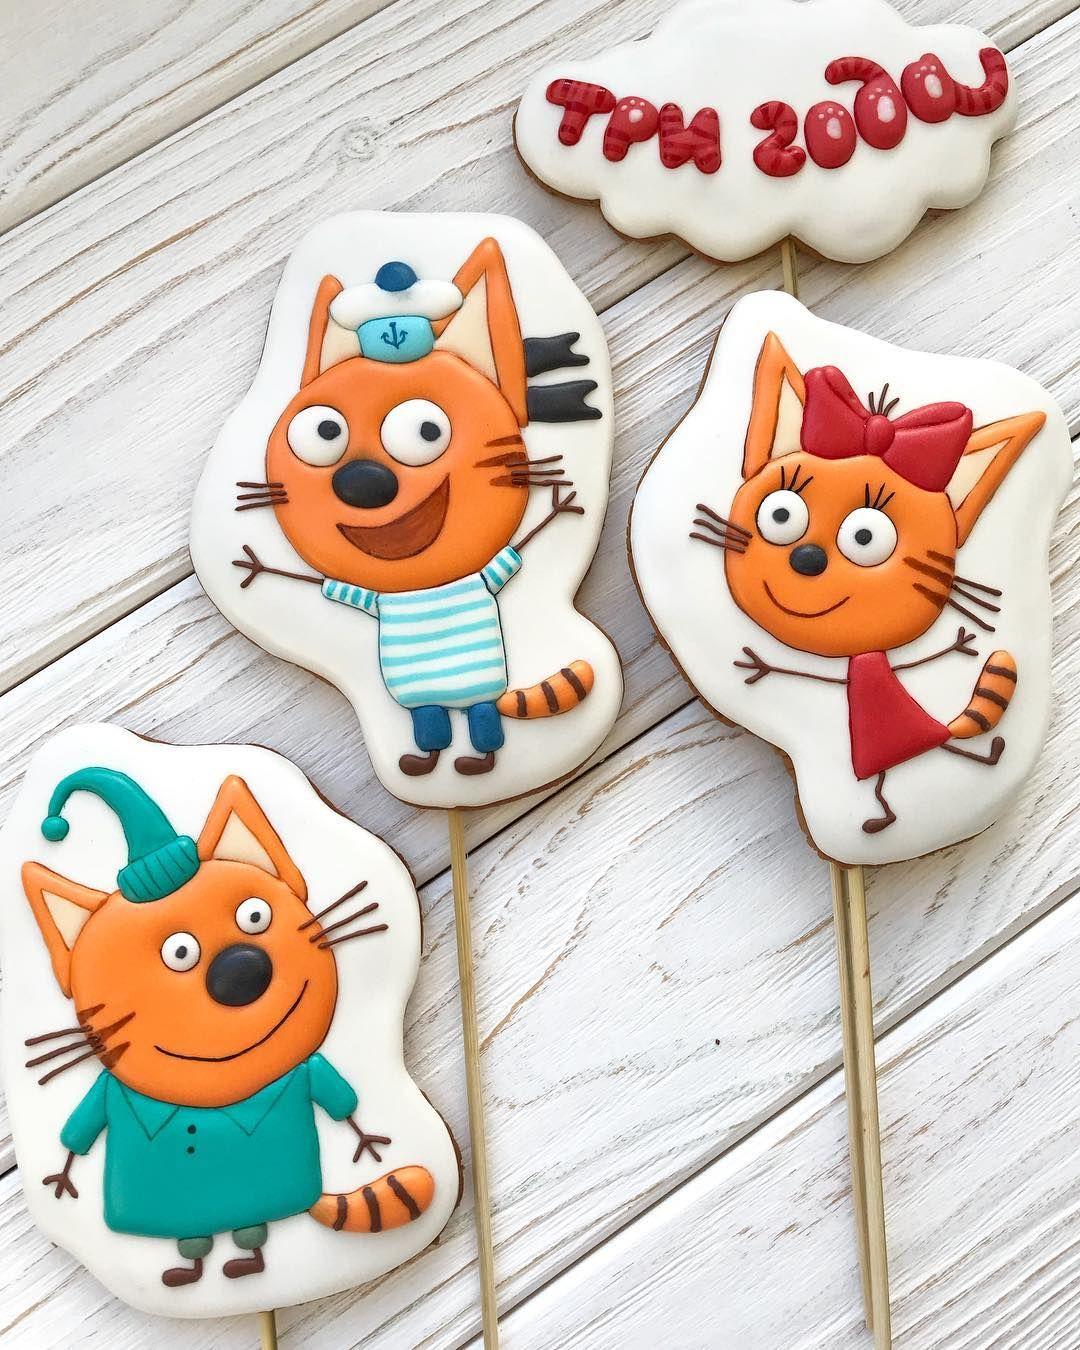 три кота картинки для торта фигурками микс